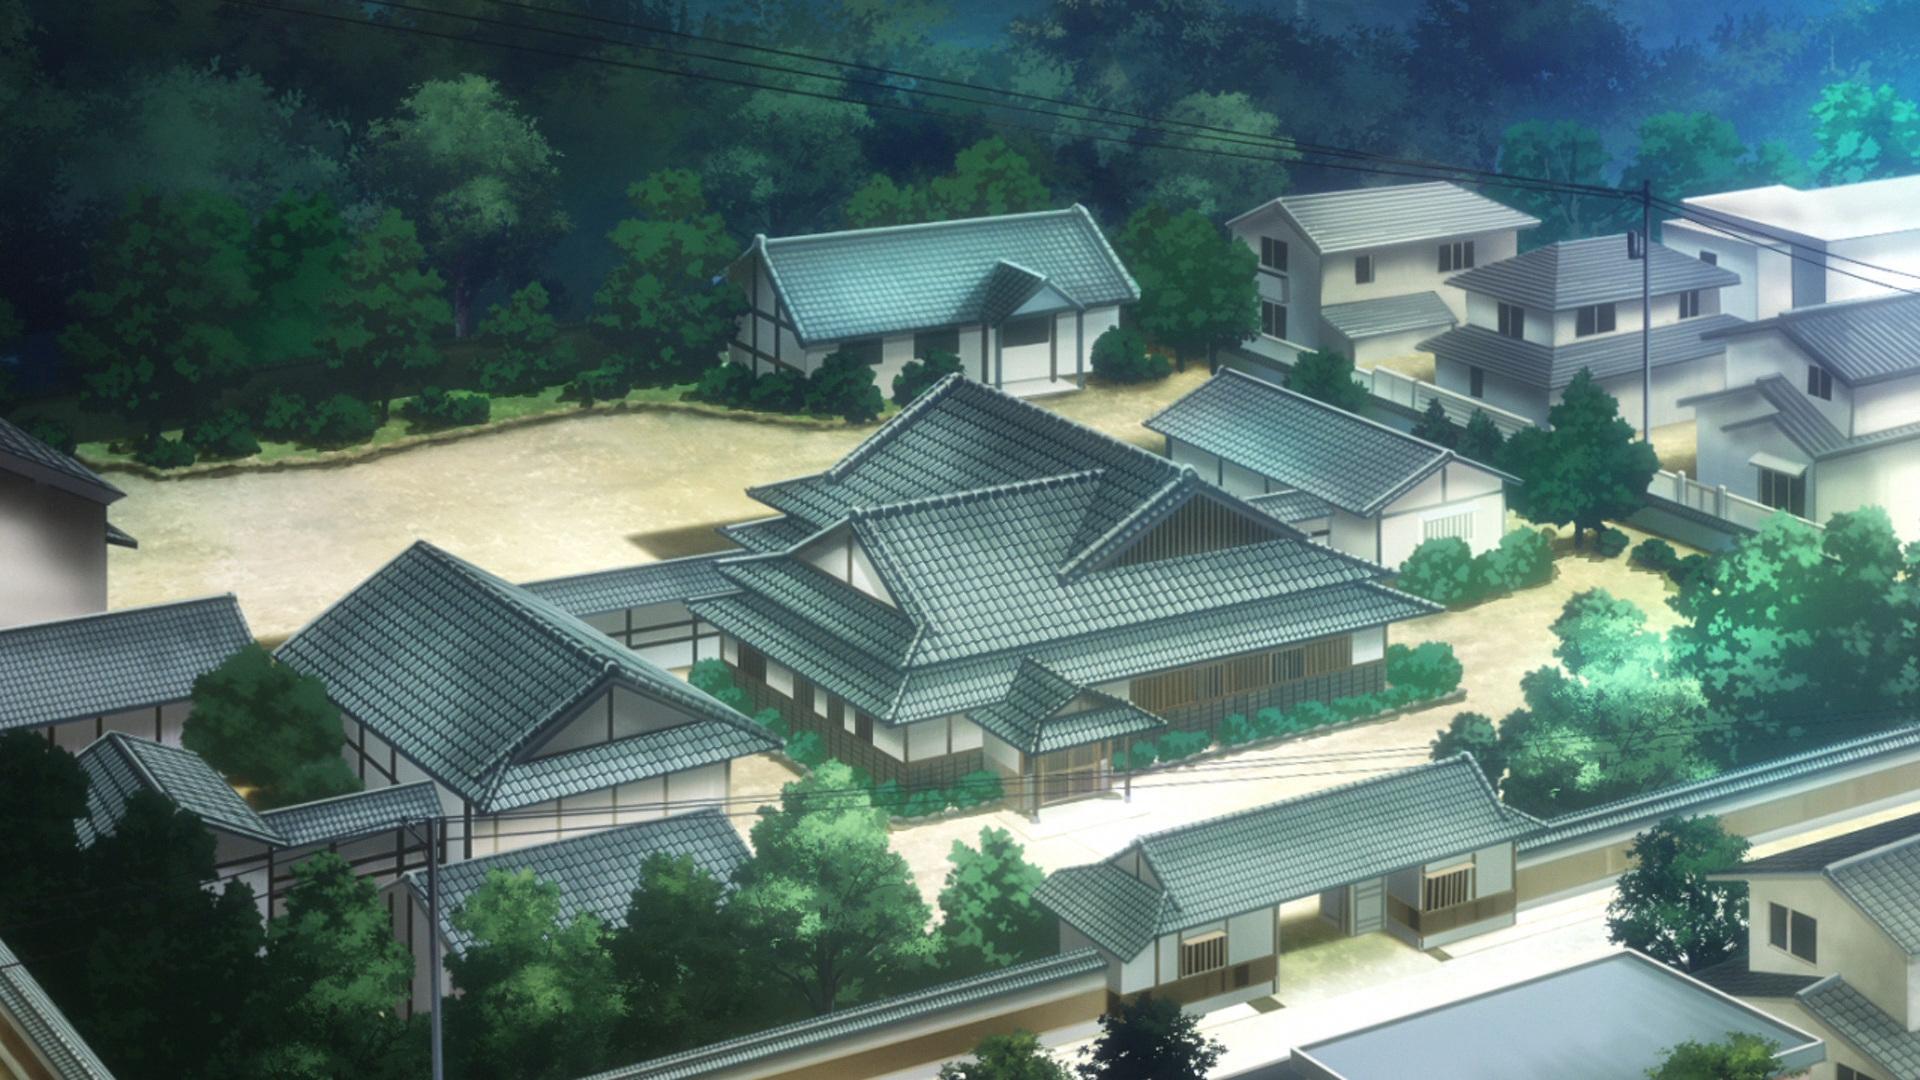 ~ Casa ~ Família Uchiha-Hyuuga (Hitsugaya) - Página 2 Gekijouban-Fate-Kaleid-Liner-Prisma-Illya-Oath-Under-Snow-_00.06.02_2018.03.31_14.06.55